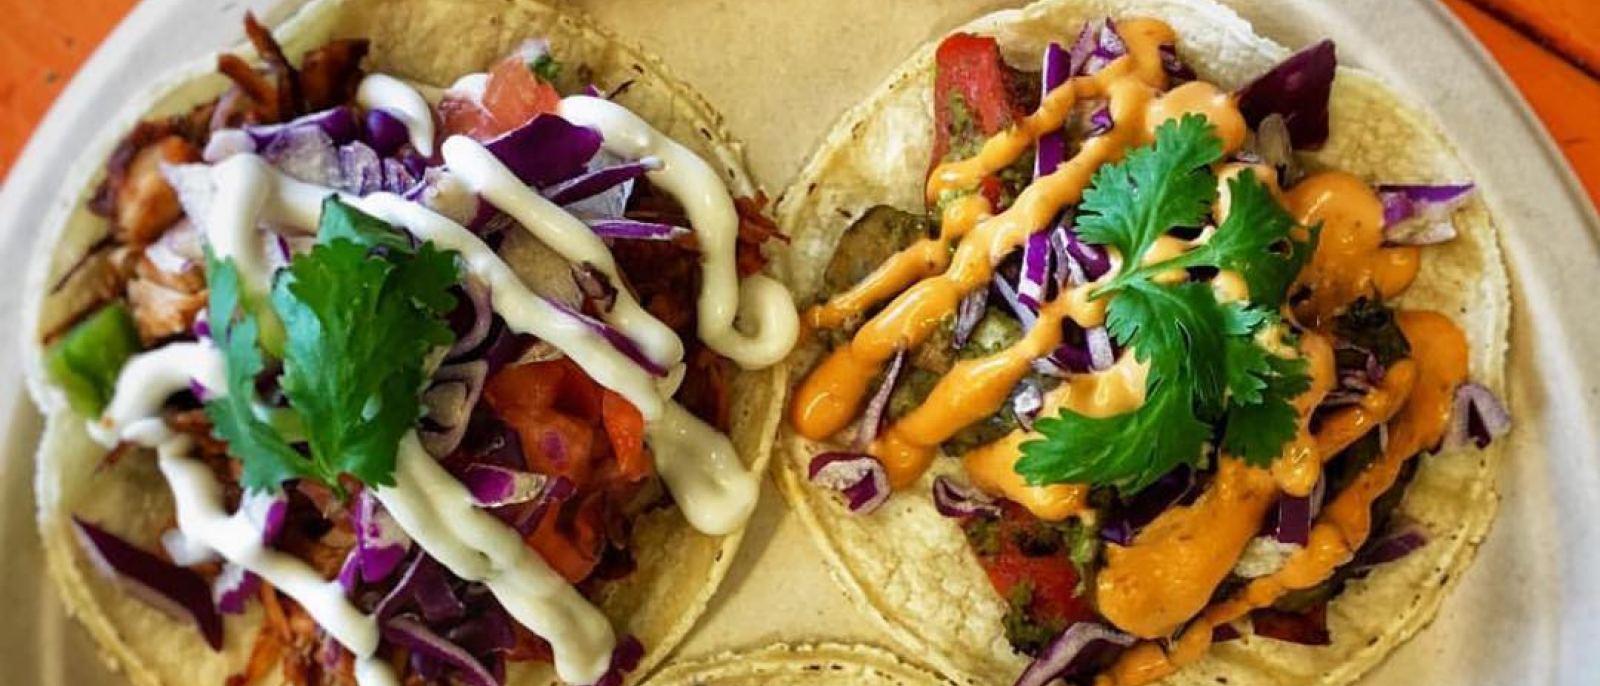 Vegan Tacos at Organix